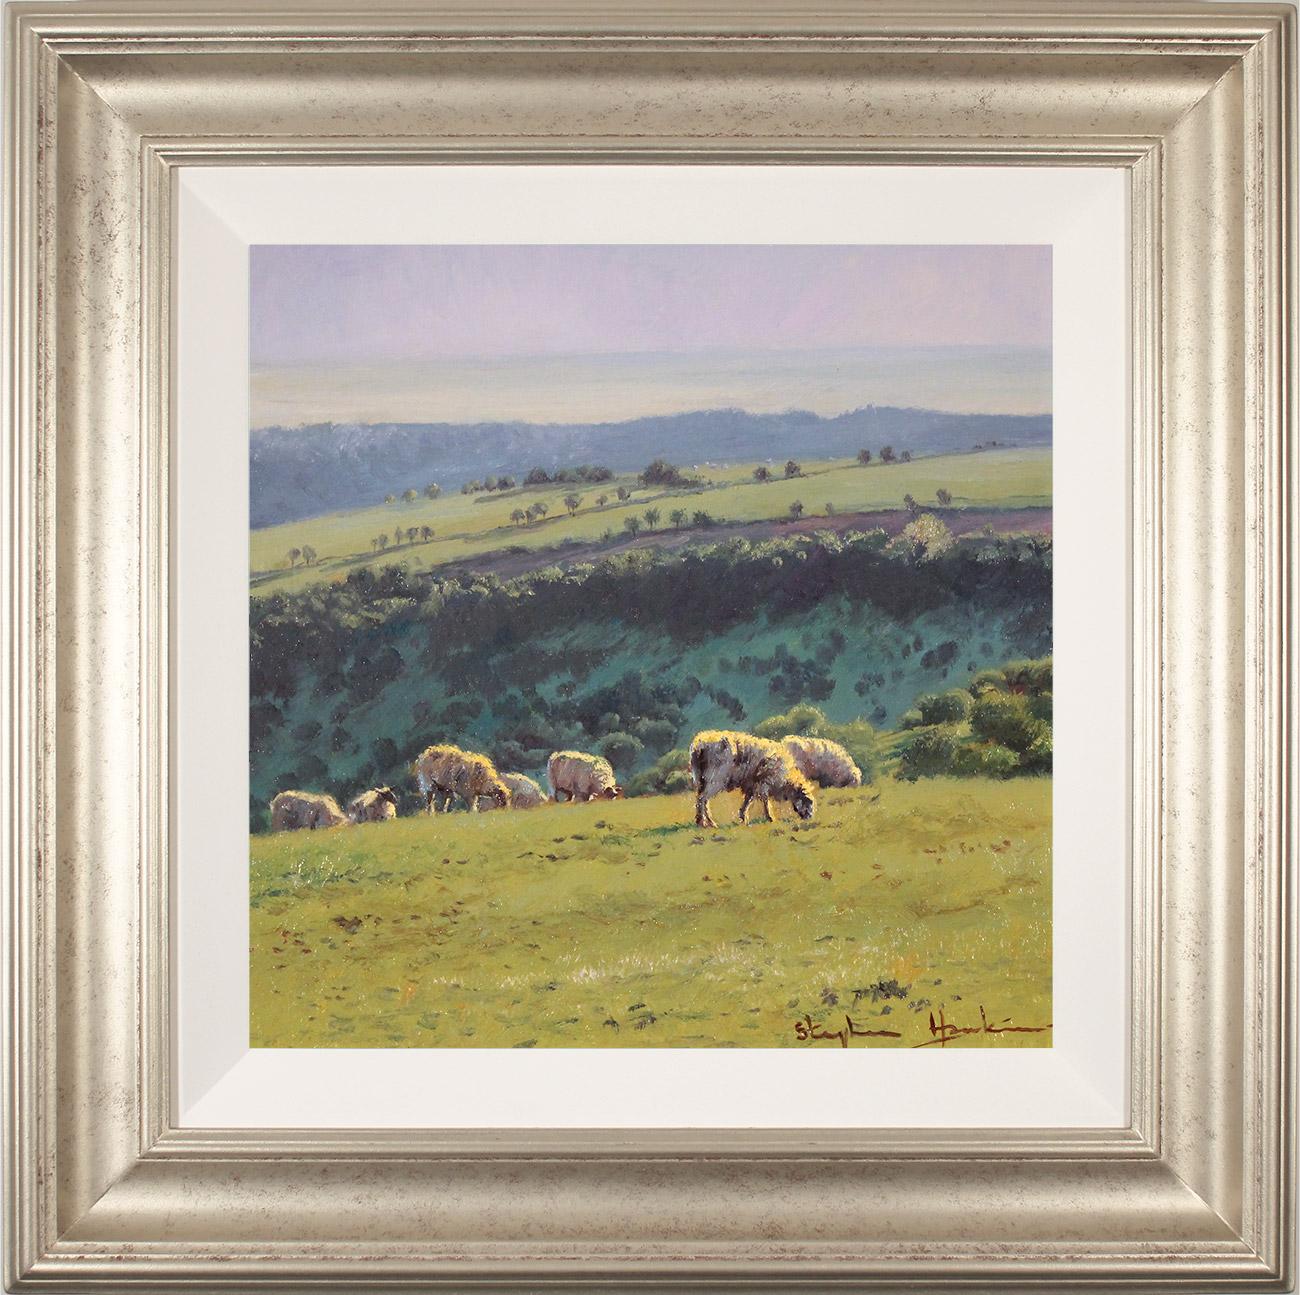 Stephen Hawkins, Original oil painting on panel, Summer Pasture, Swaledale Click to enlarge